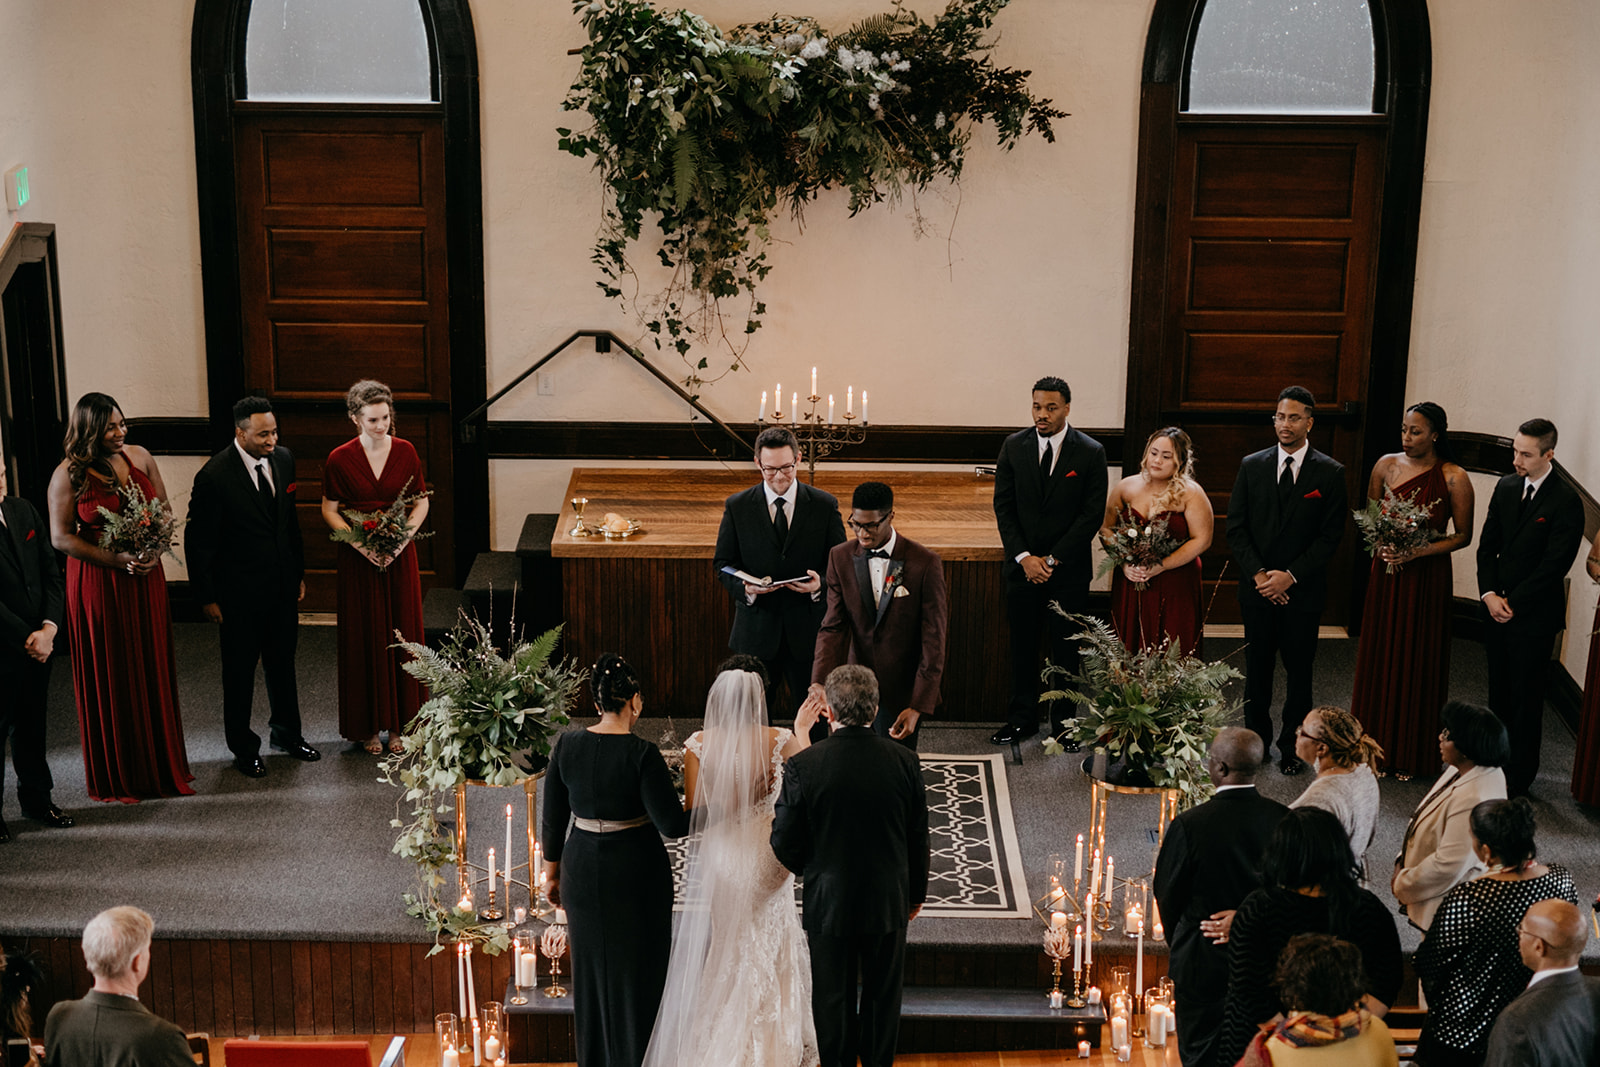 portland - wedding - photographer - doorofhopechurch448.jpg